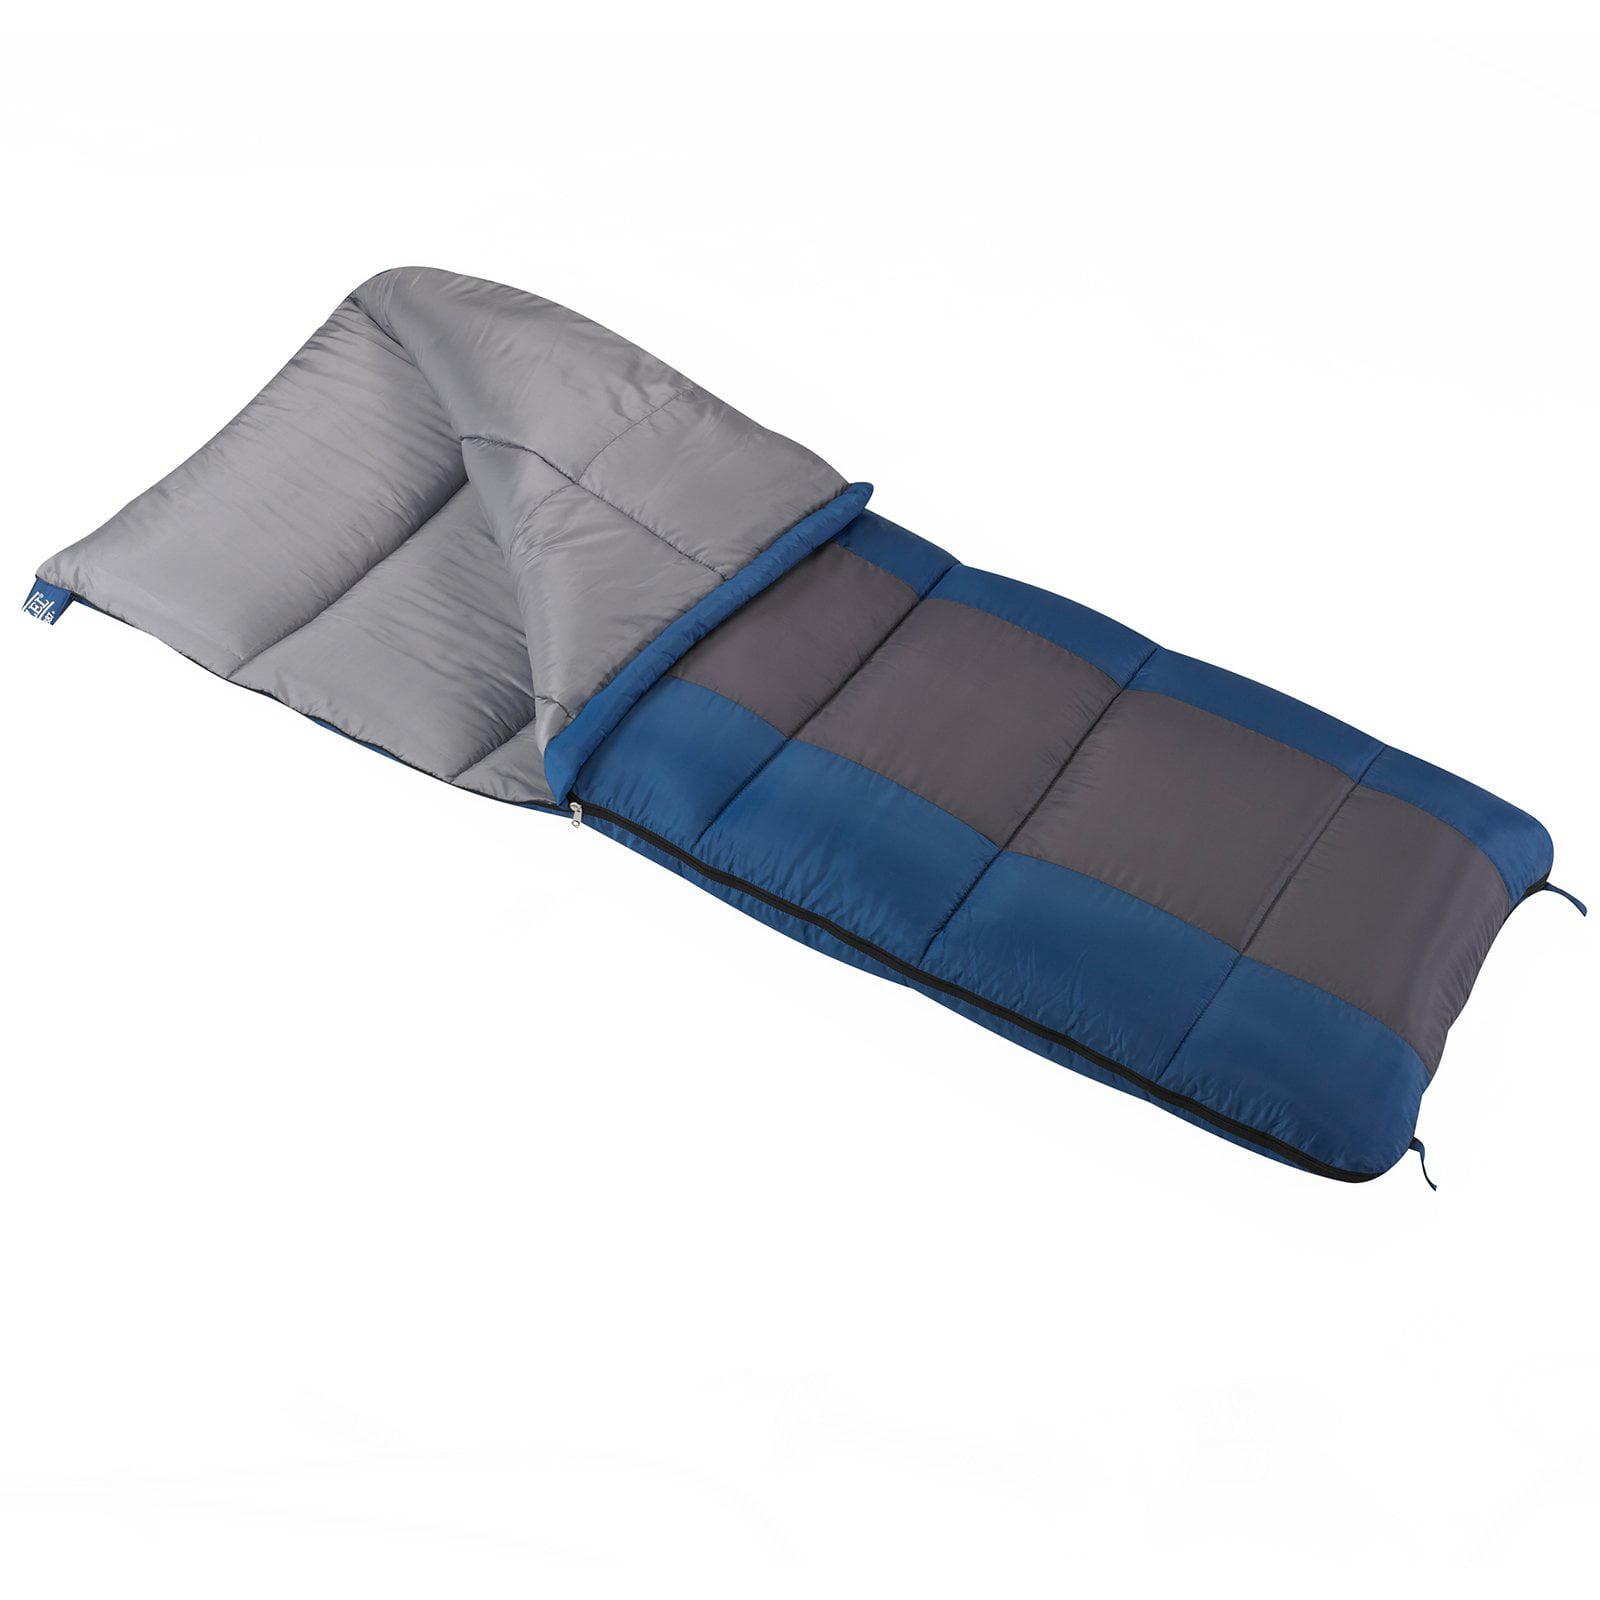 Wenzel Sunward Sleeping Bag by Overstock